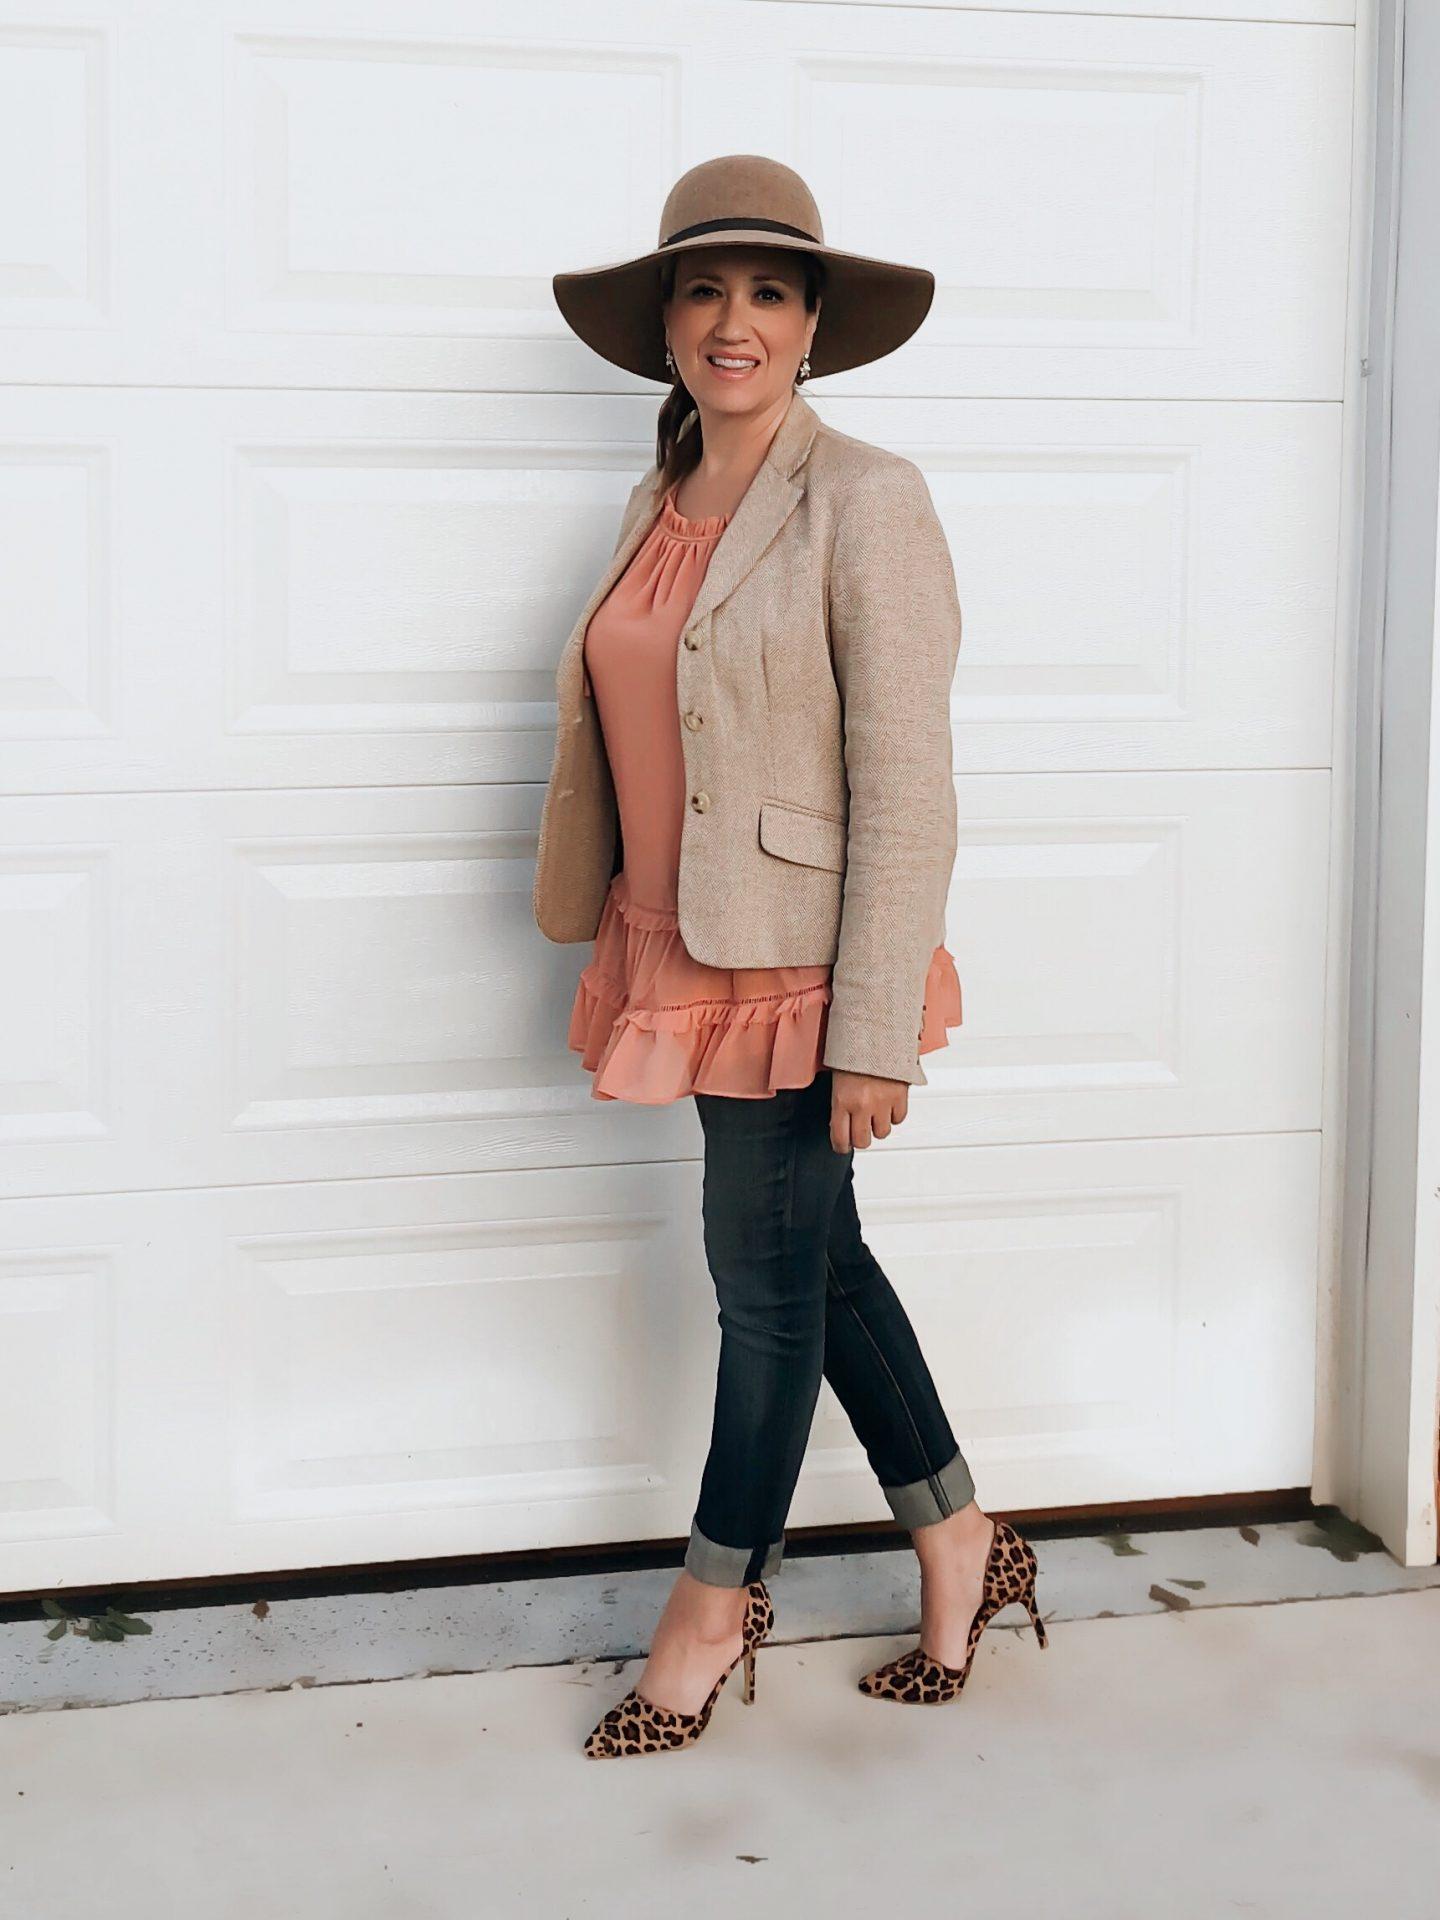 3 Reasons You Should Be Wearing Hats This Season